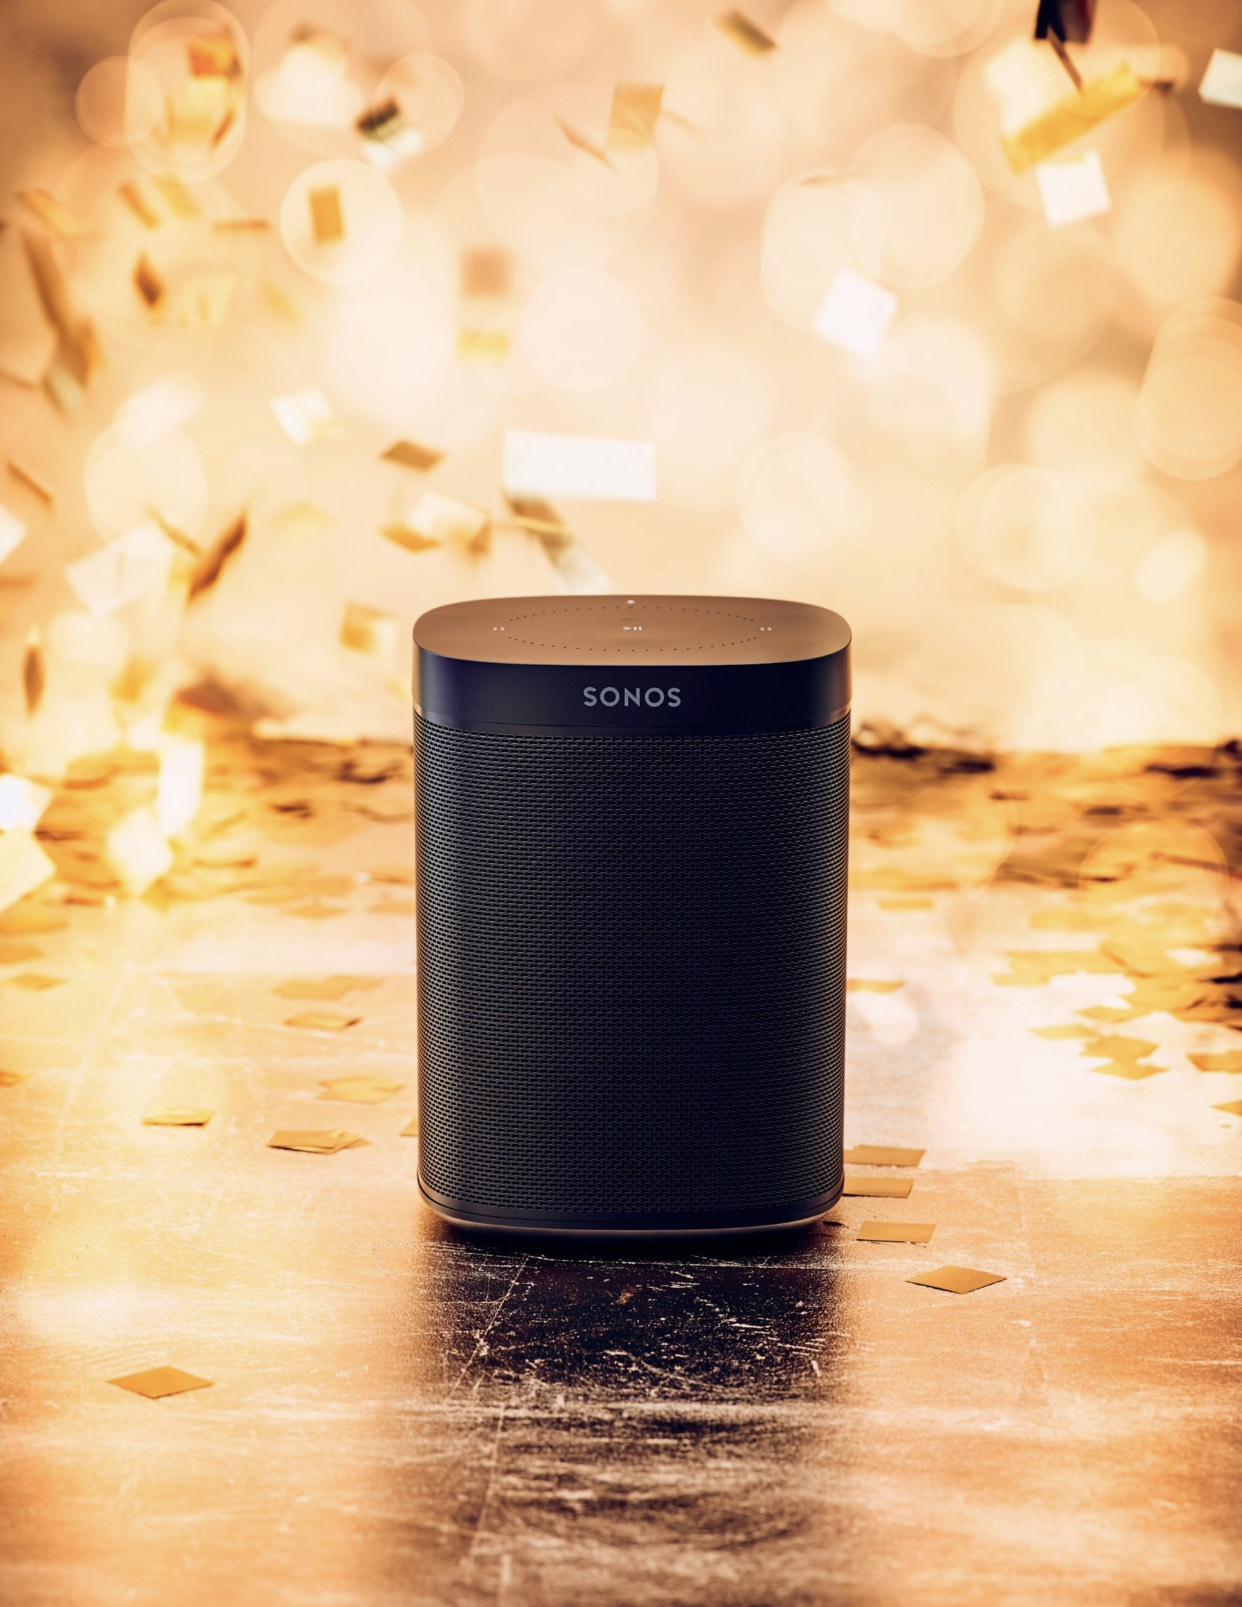 Sonos One (Gen 2) Smart Speaker with Voice Control, Black £149 at John Lewis & Partners